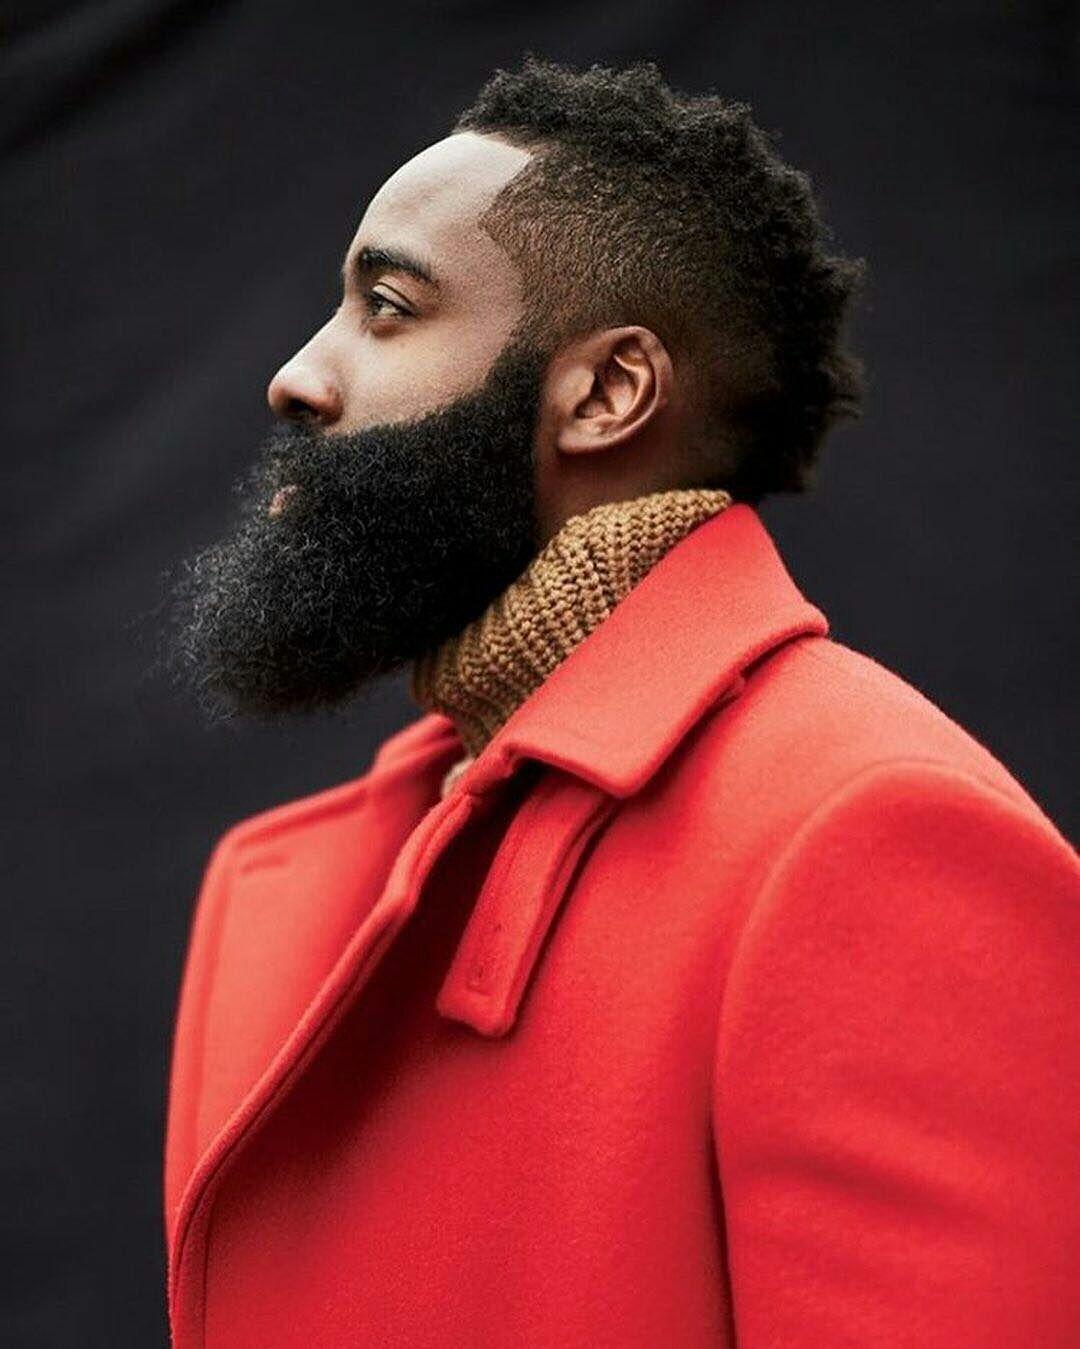 f4228e2236dd Maybe it s the beard! Find Your True North!  nbafinals  beard  beards   beardstyle  gentleman  gentlemen  mensgrooming